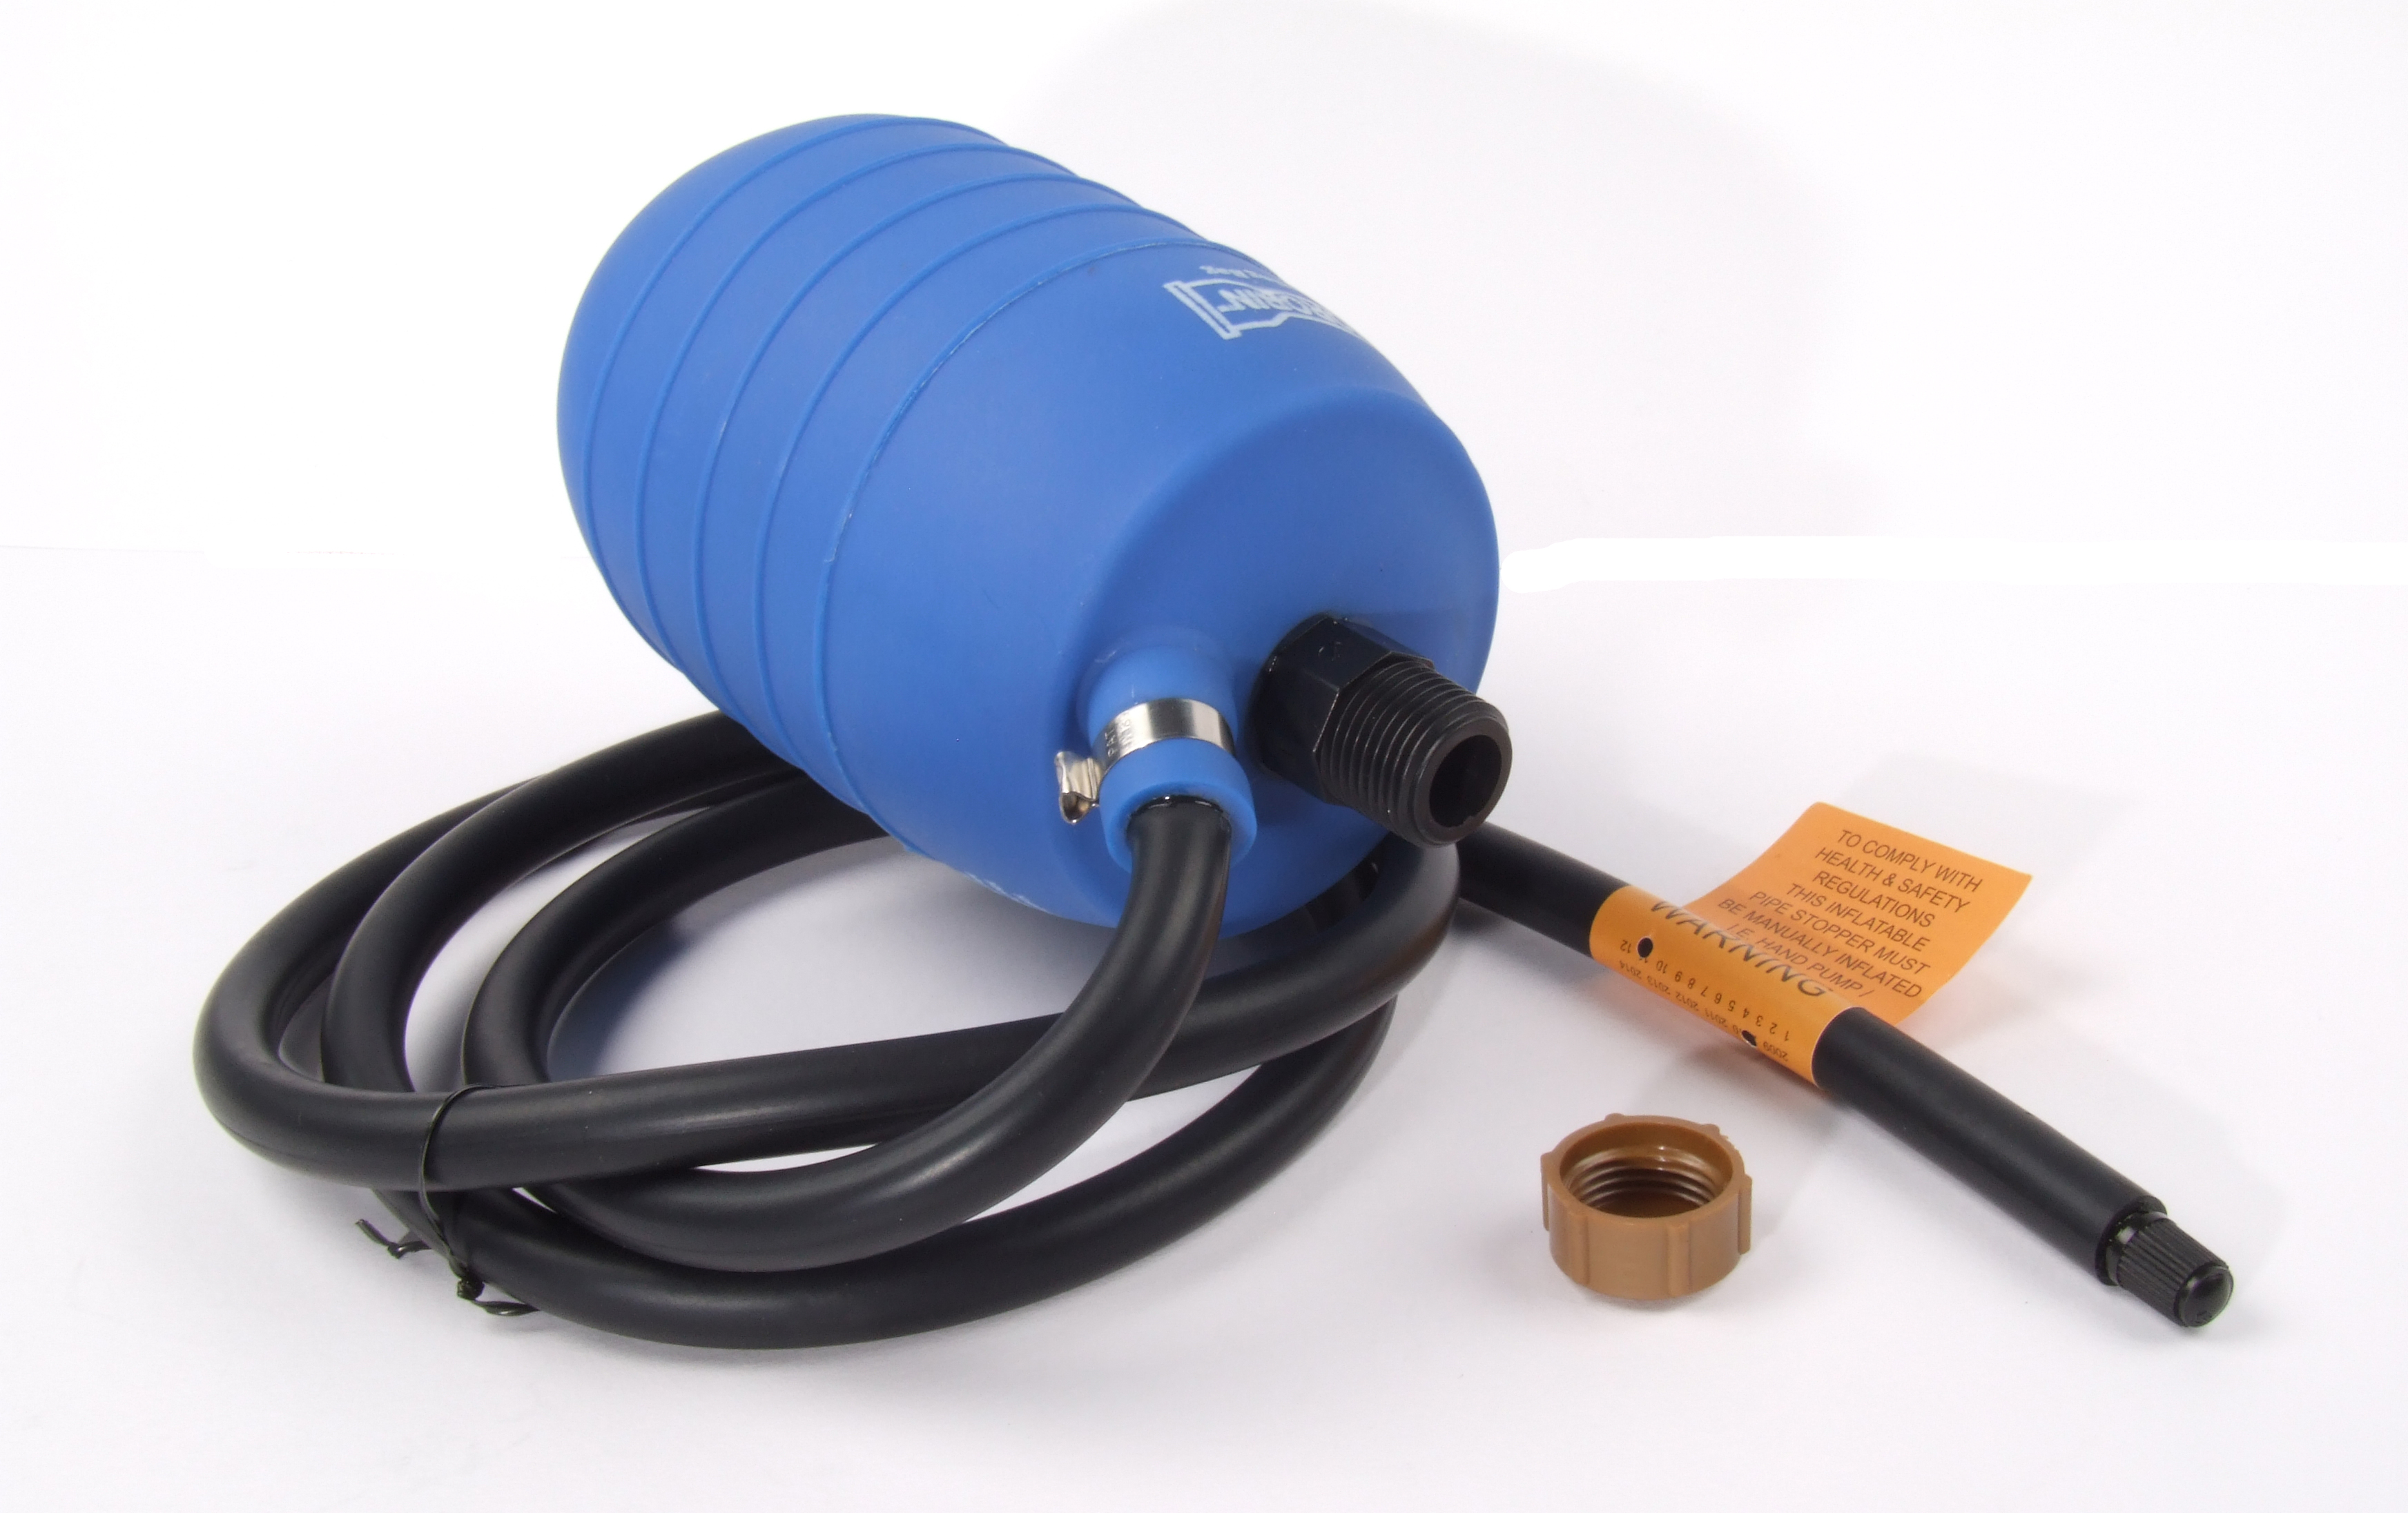 Test Plugs Air Test Kits Amp Air Bags Plastech Southern Ltd